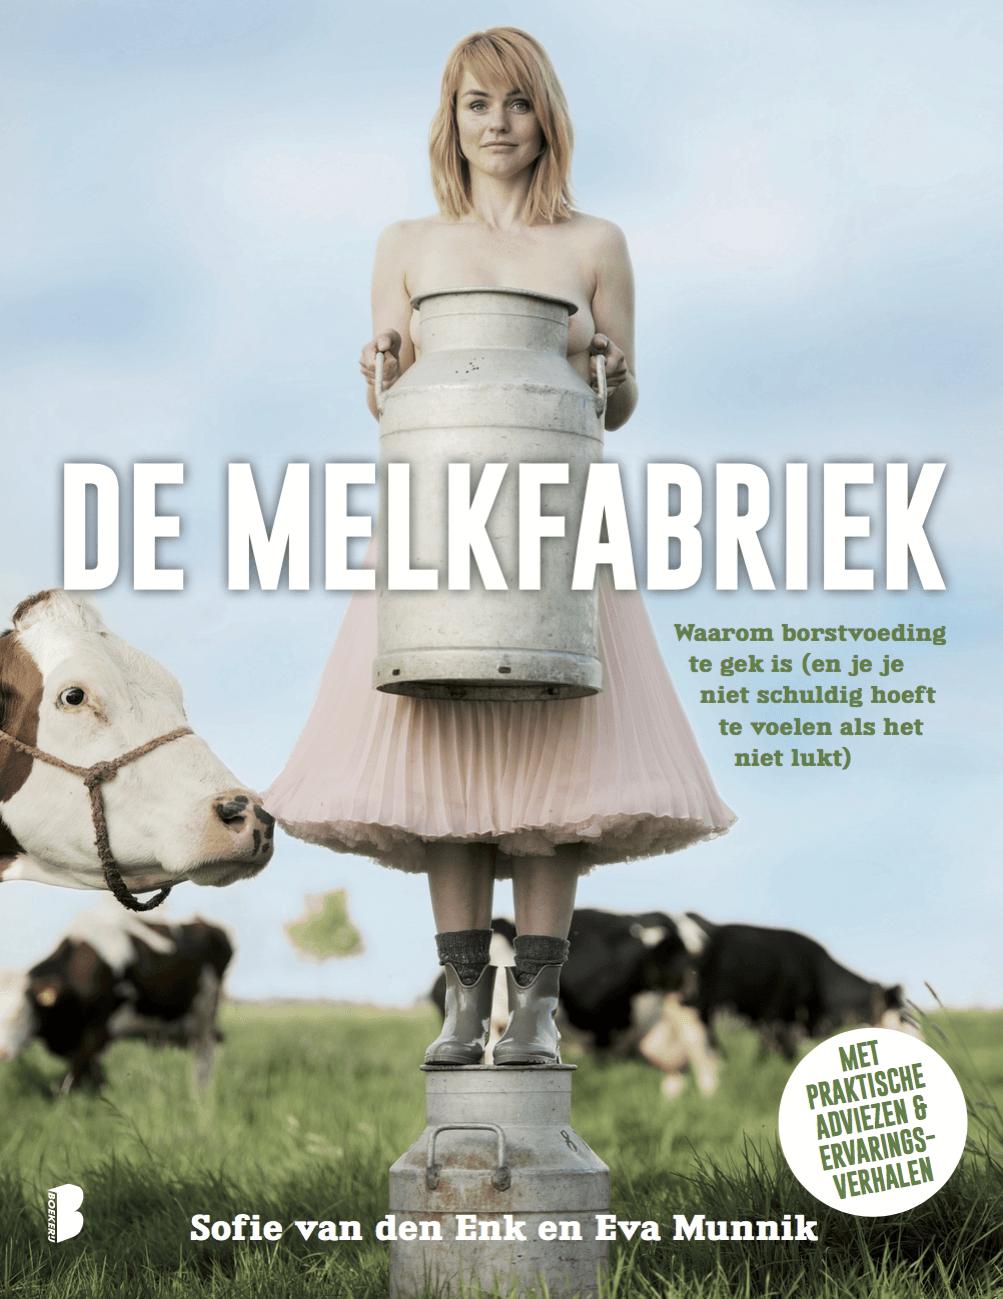 De Melkfabriek Borstvoeding